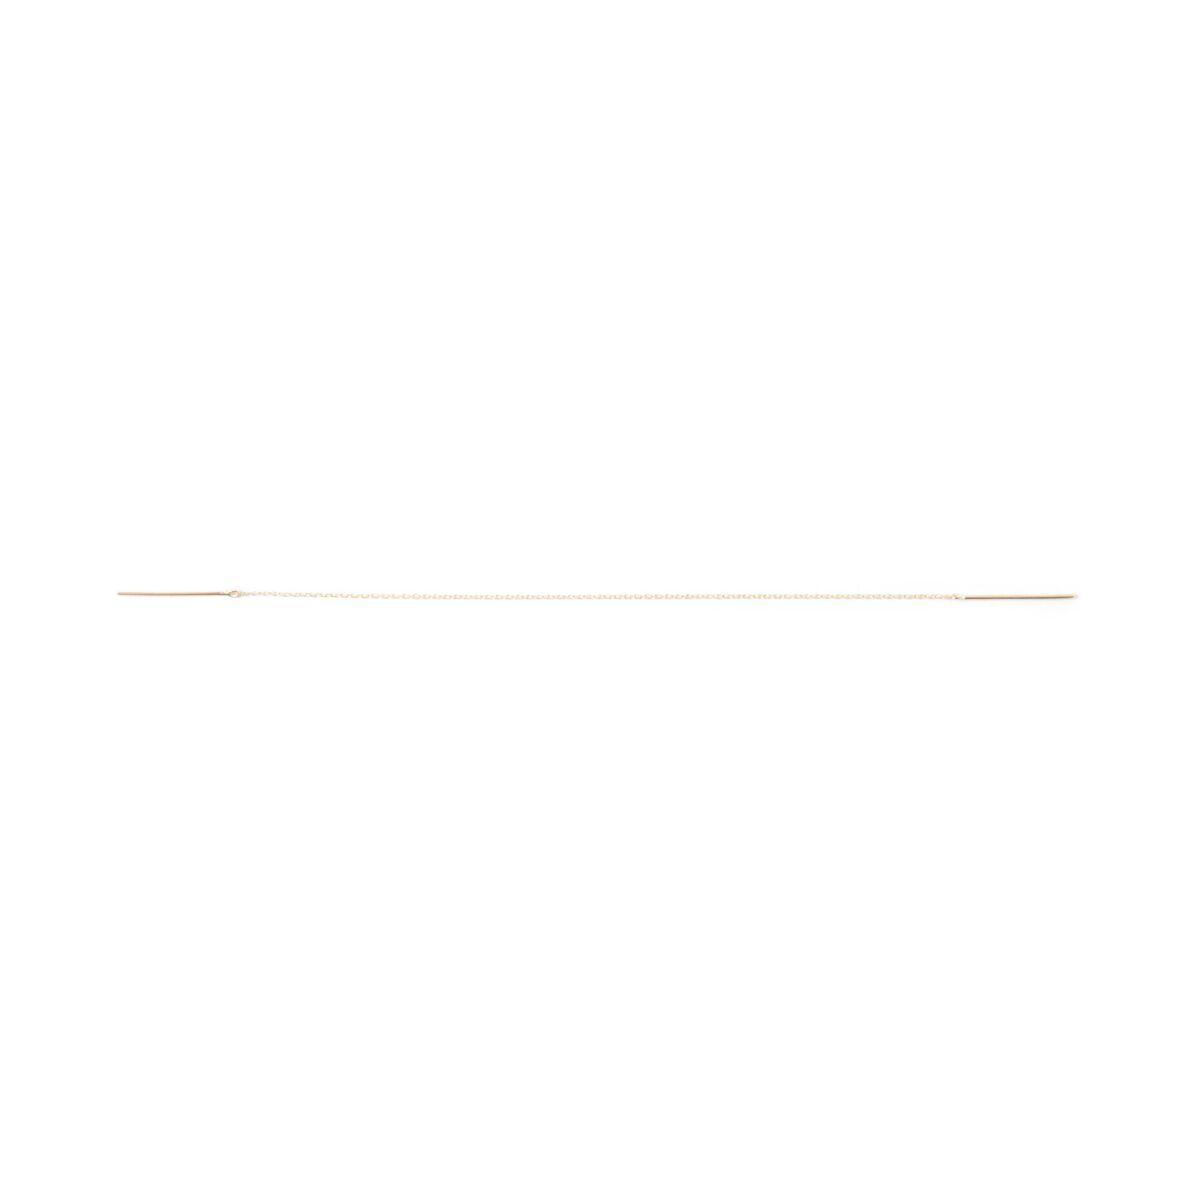 Long Stitch Earring (single) image